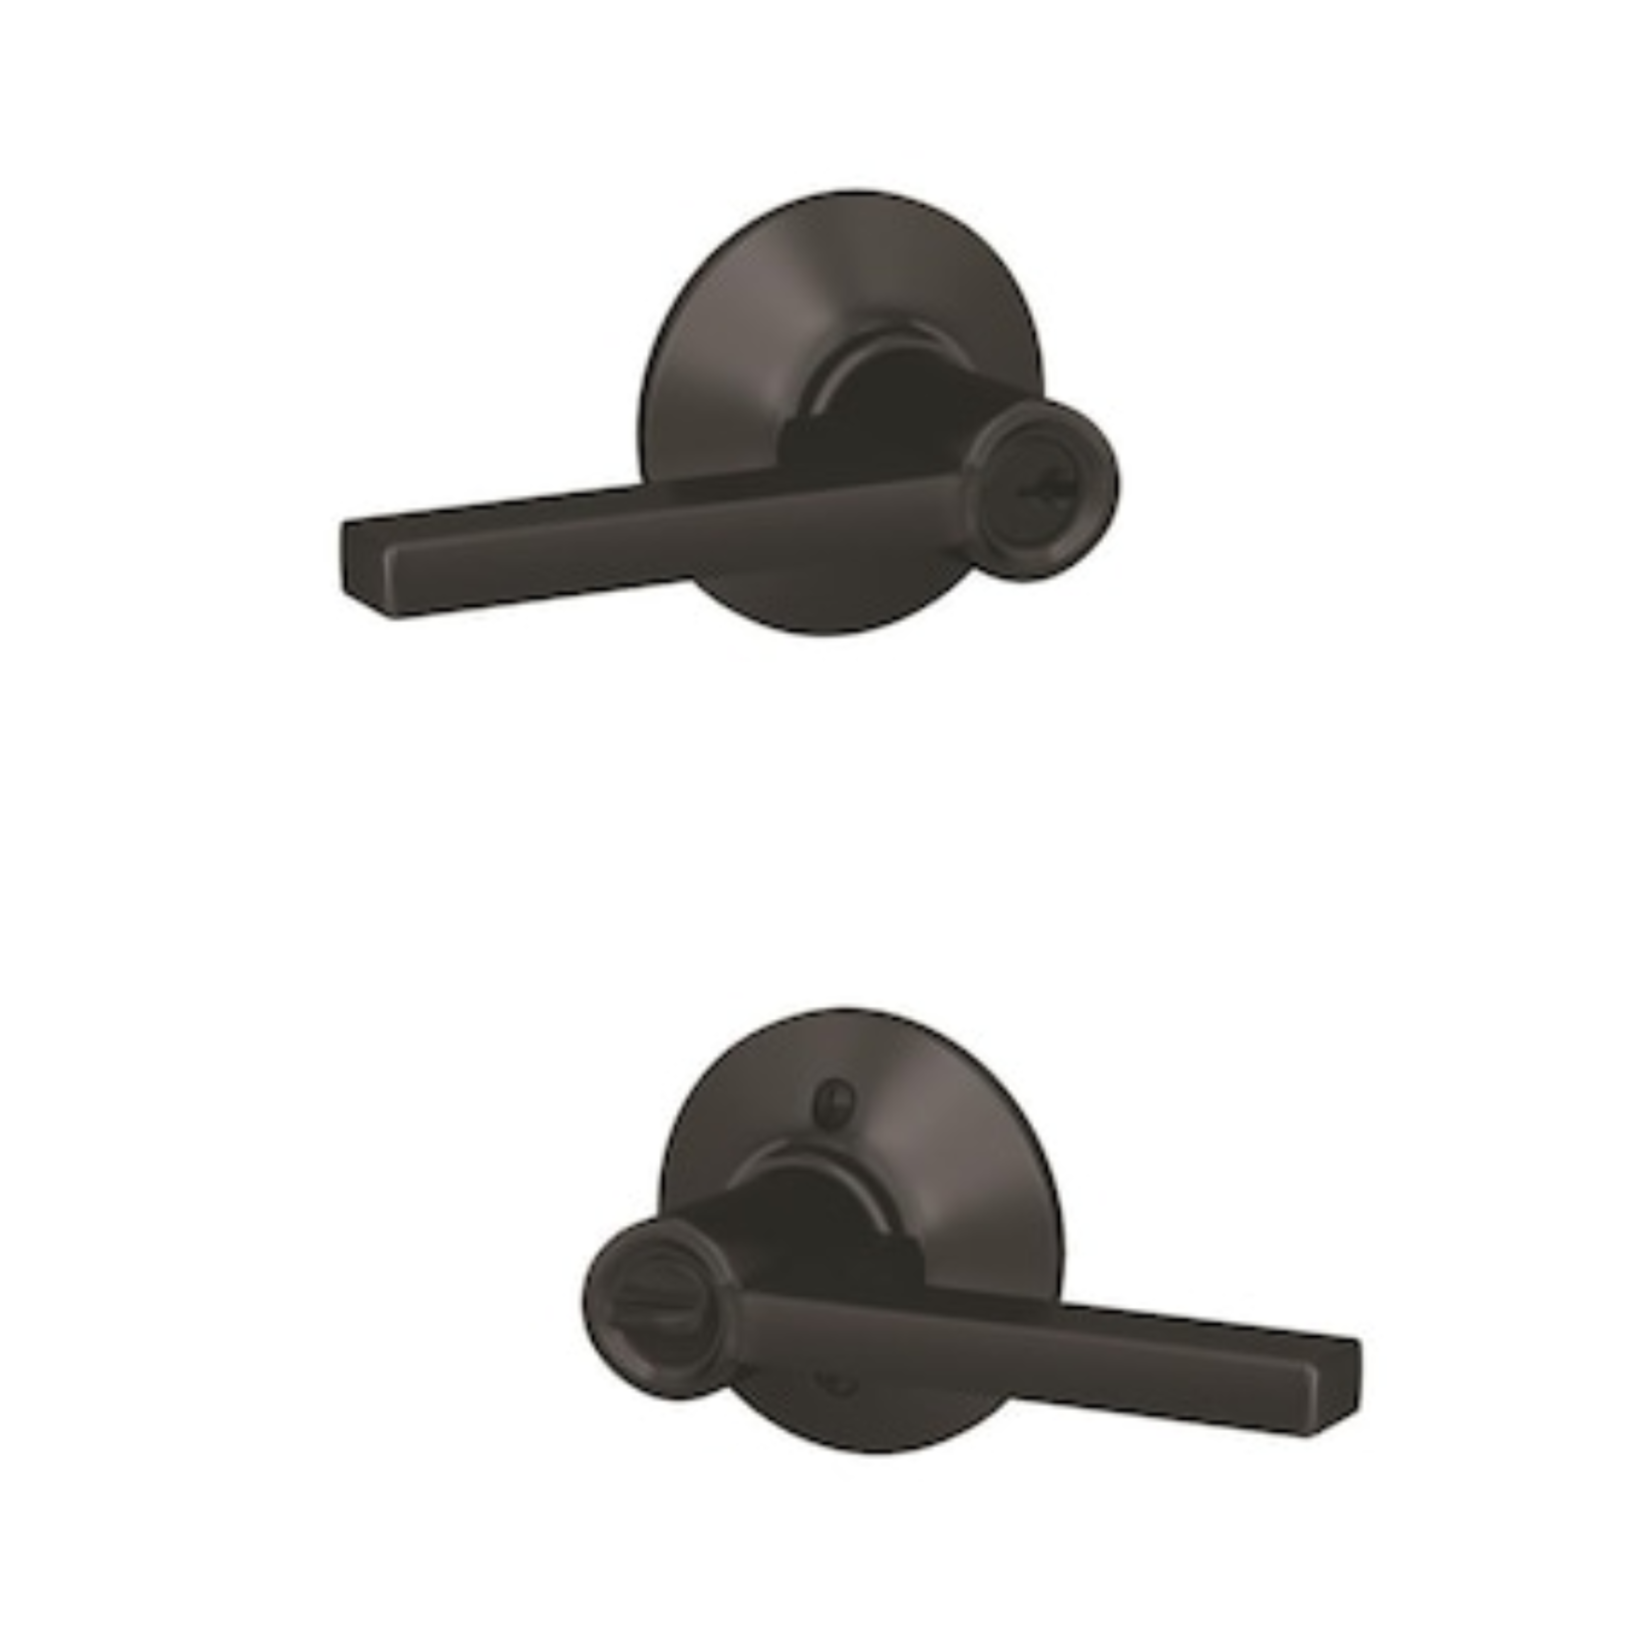 10269 Schlage Latitude Universal Keyed Entry Door Handle